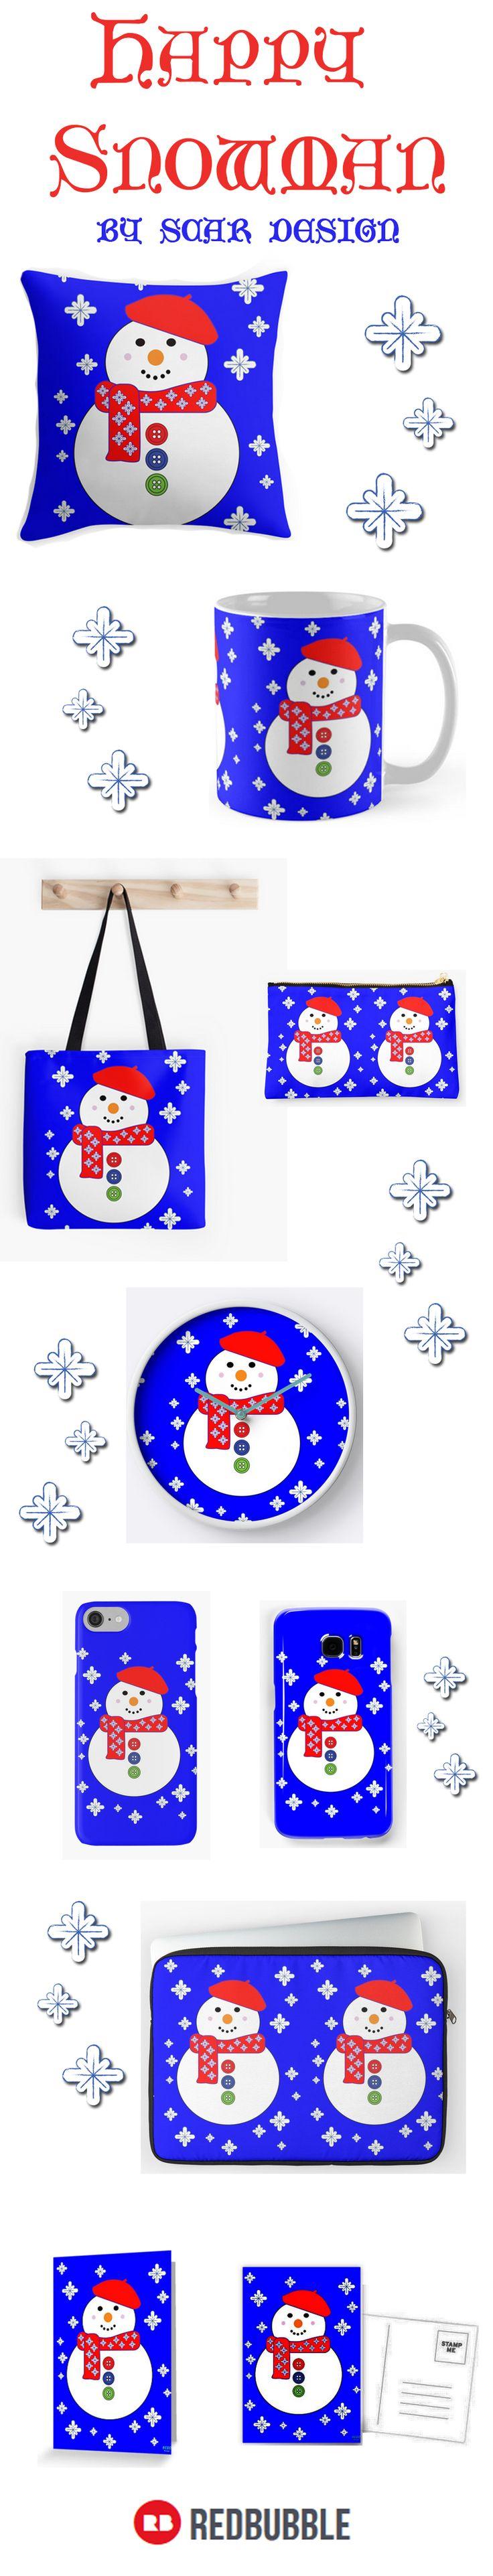 Happy Snowman Gifts by Scar Design #Christmas #christmasgifts #christmassnowman #christmasdecor #homedecor #snowman #snowmankidsroom #christmastotebag #organizepouch #snowmanpillow #kidsroom #kidsmug #snowmanmug #christmaspillow #home #homegifts #wallart #holidaygifts #snowmanclock #kidswallclock #wallclock#happy #love #jinglebells #merrychristmas #happyholidays #lovelygifts #giftsforhim #giftsforher #giftsforkids #santaclausgifts #snow #letitsnow #XmasGifts #Xmas